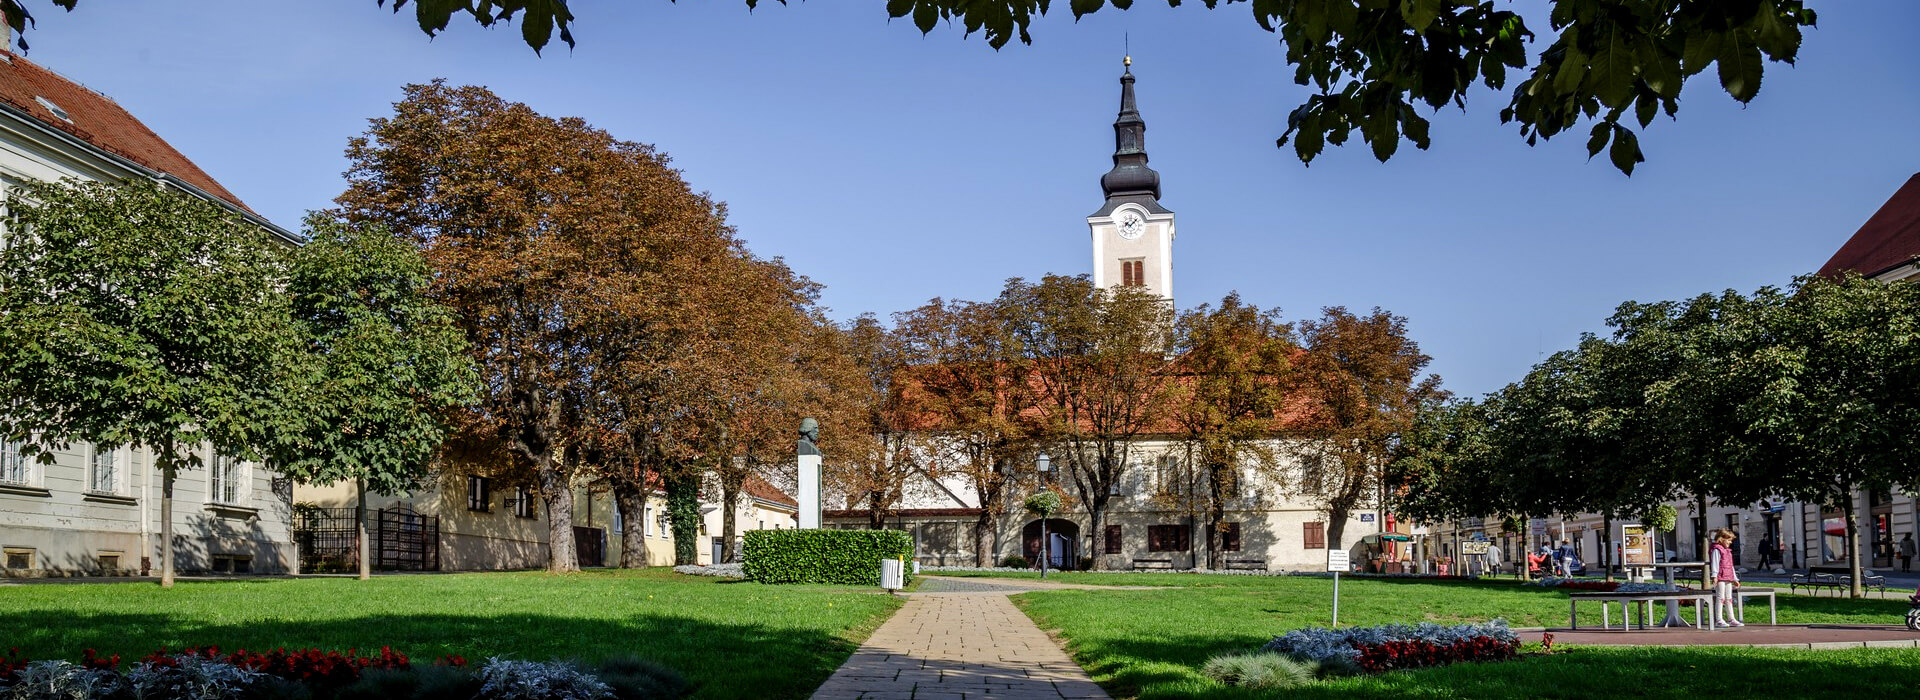 Dan grada Križevaca